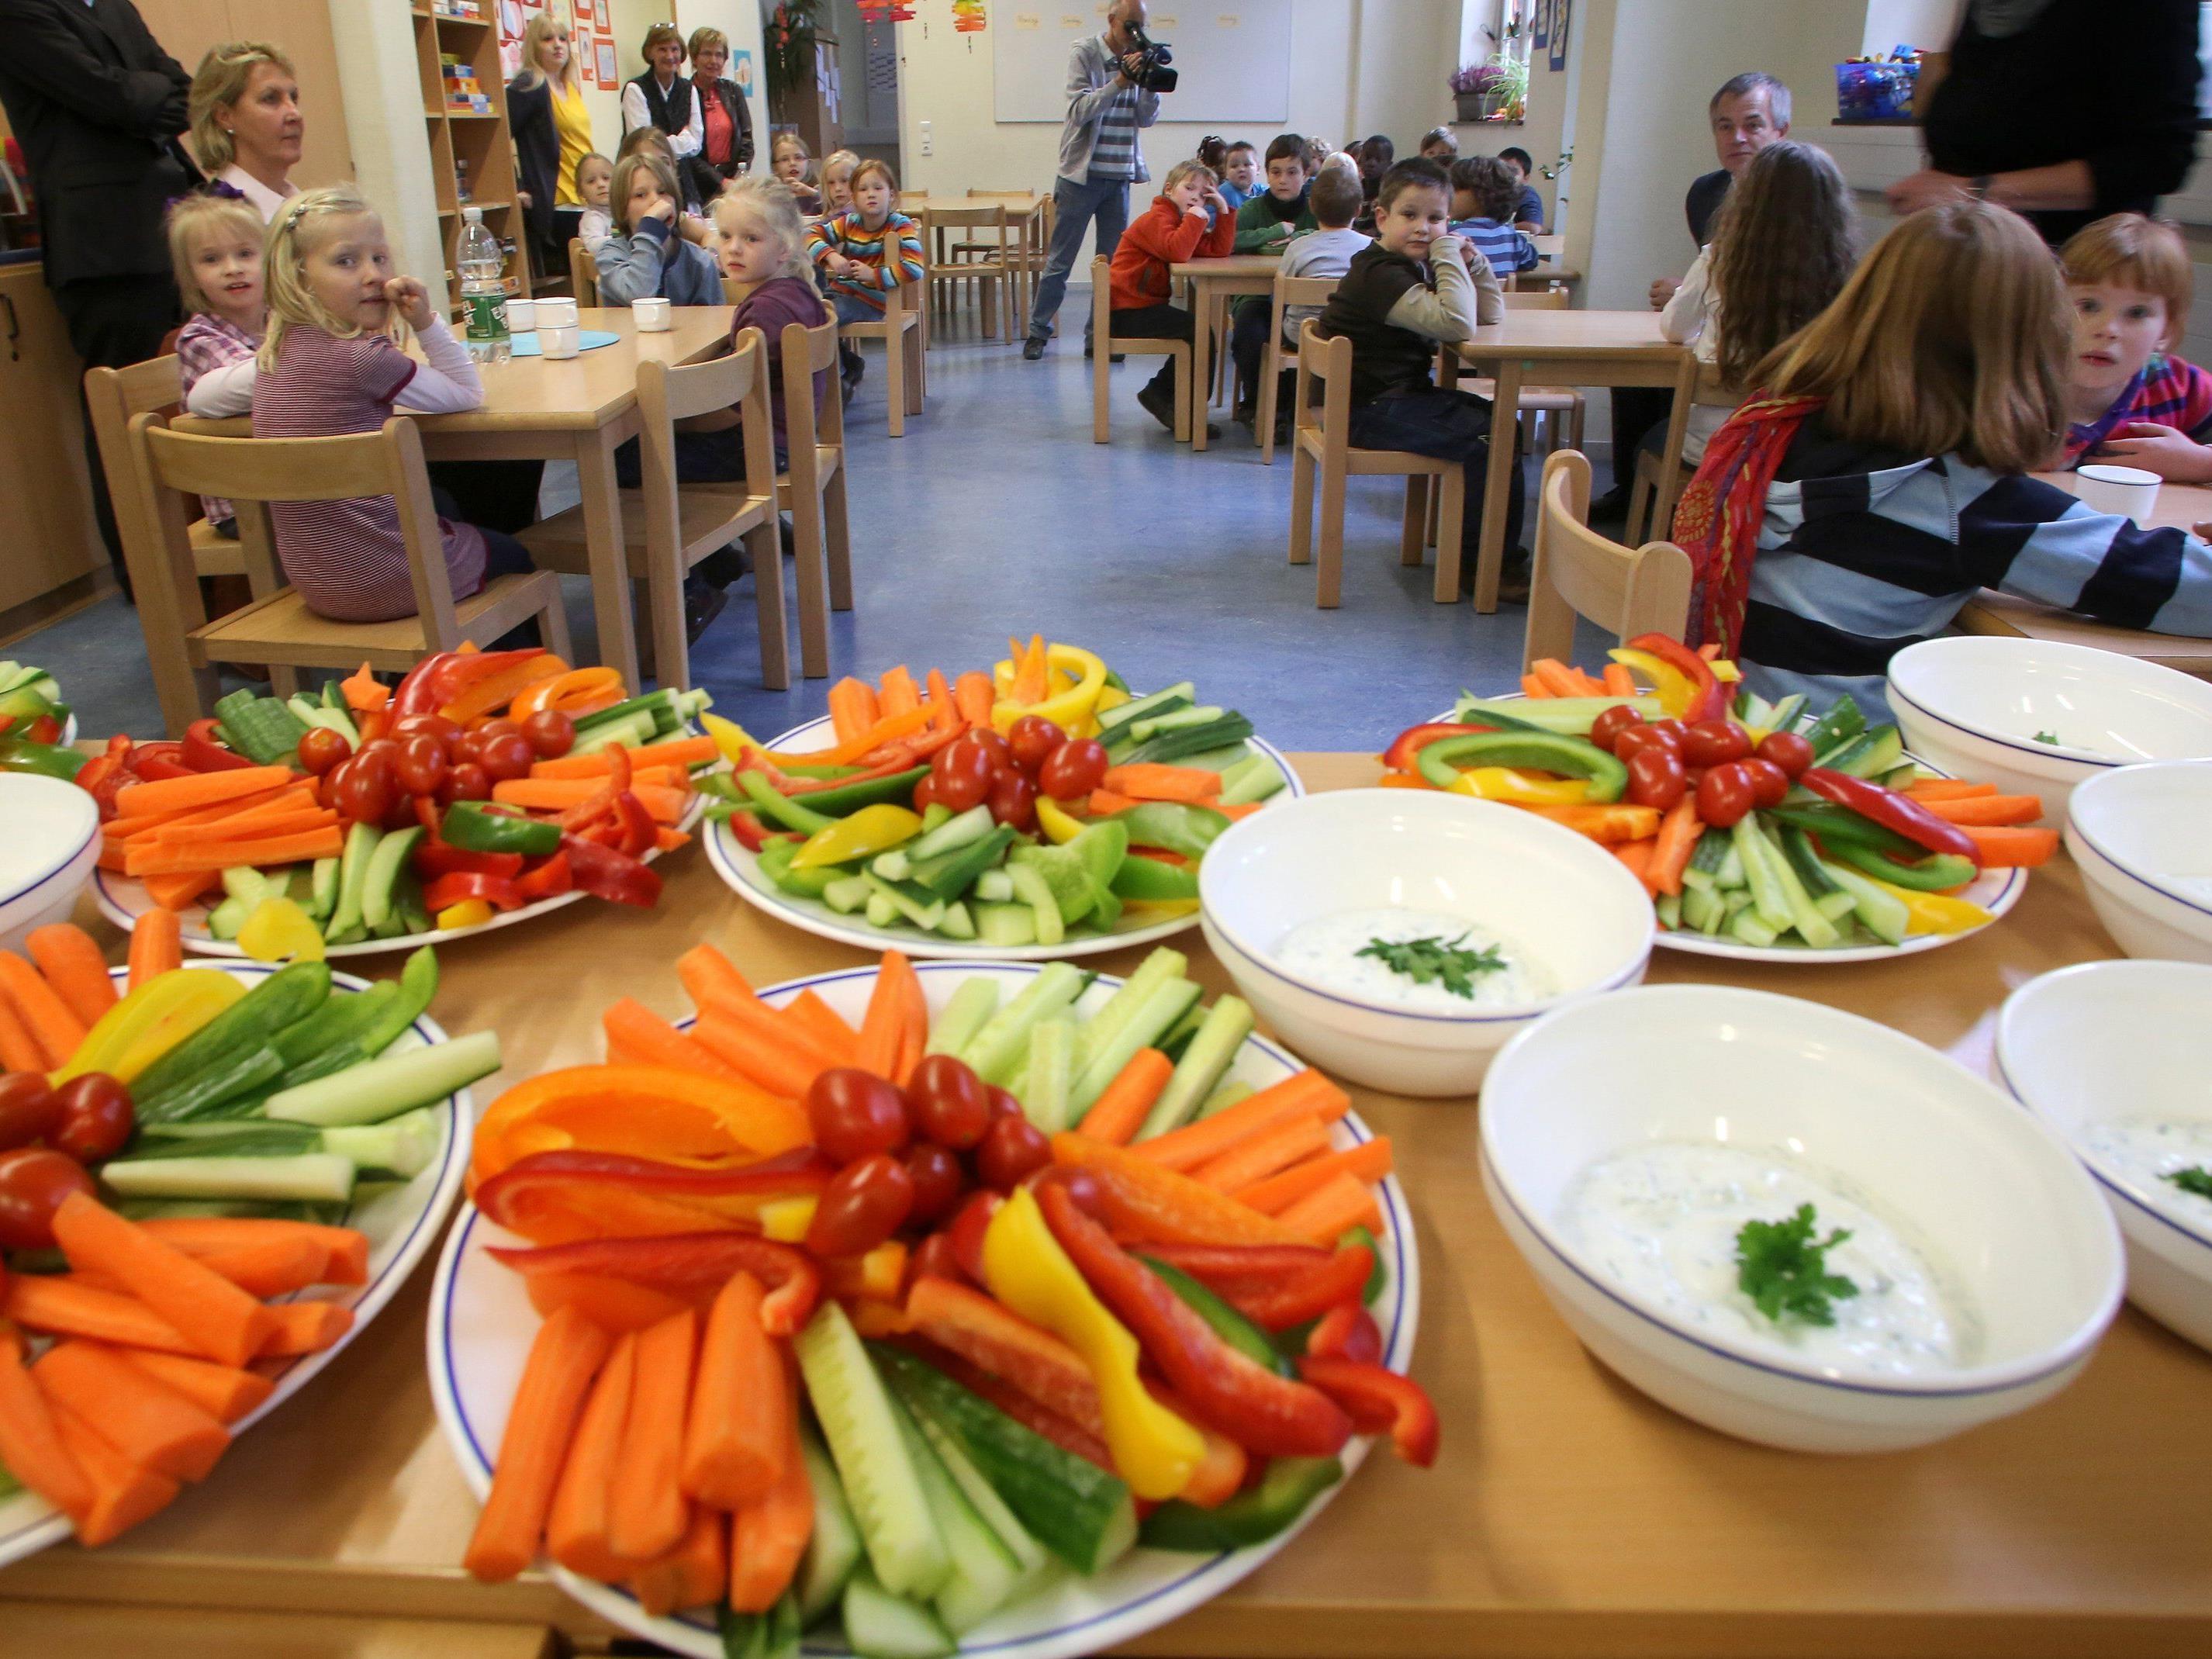 Soll gesunde Ernährung in den Schulunterricht integriert werden?